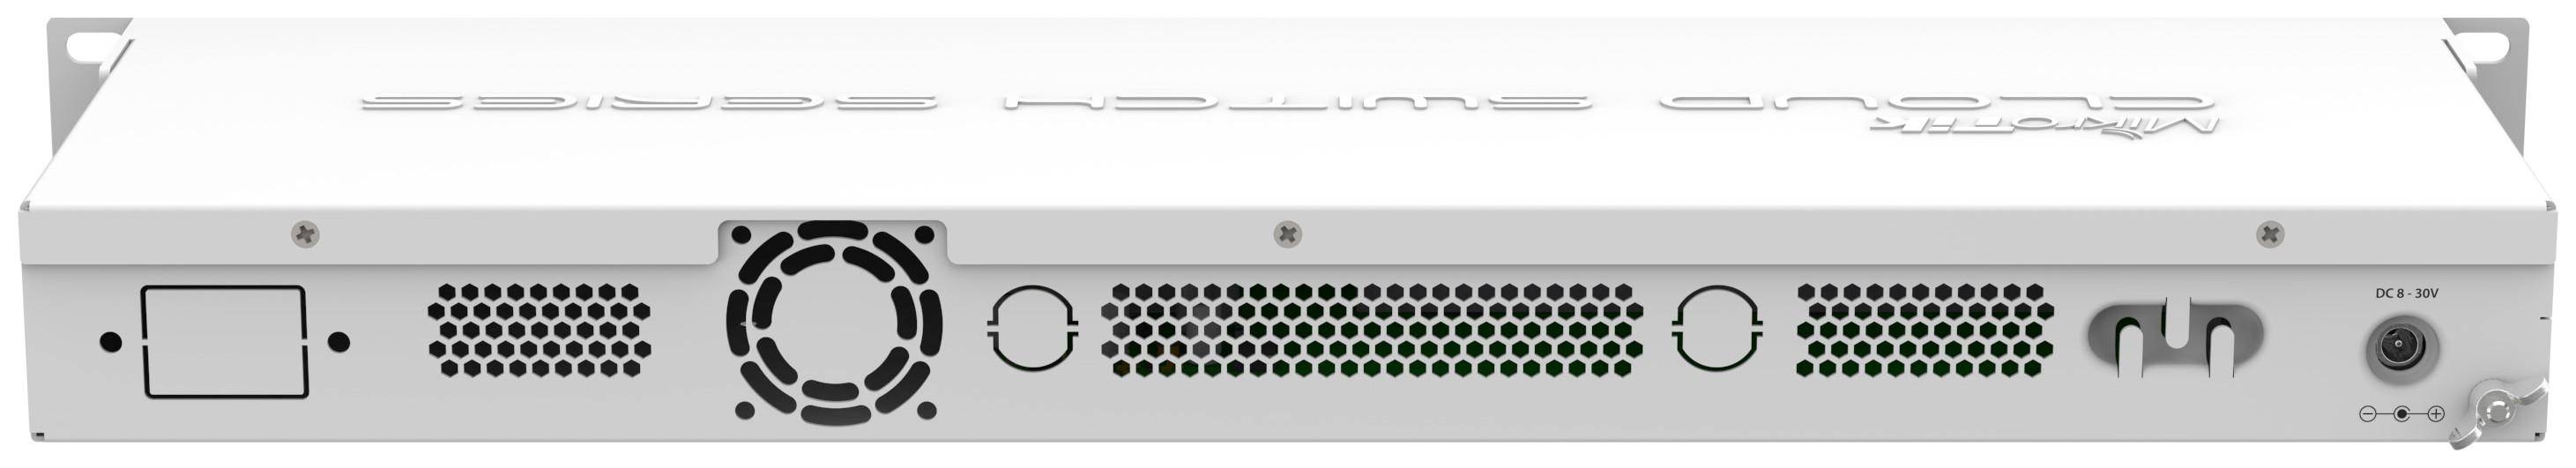 MikroTik Cloud Smart Switch CSS326-24G-2S+RM (Layer2 Switch